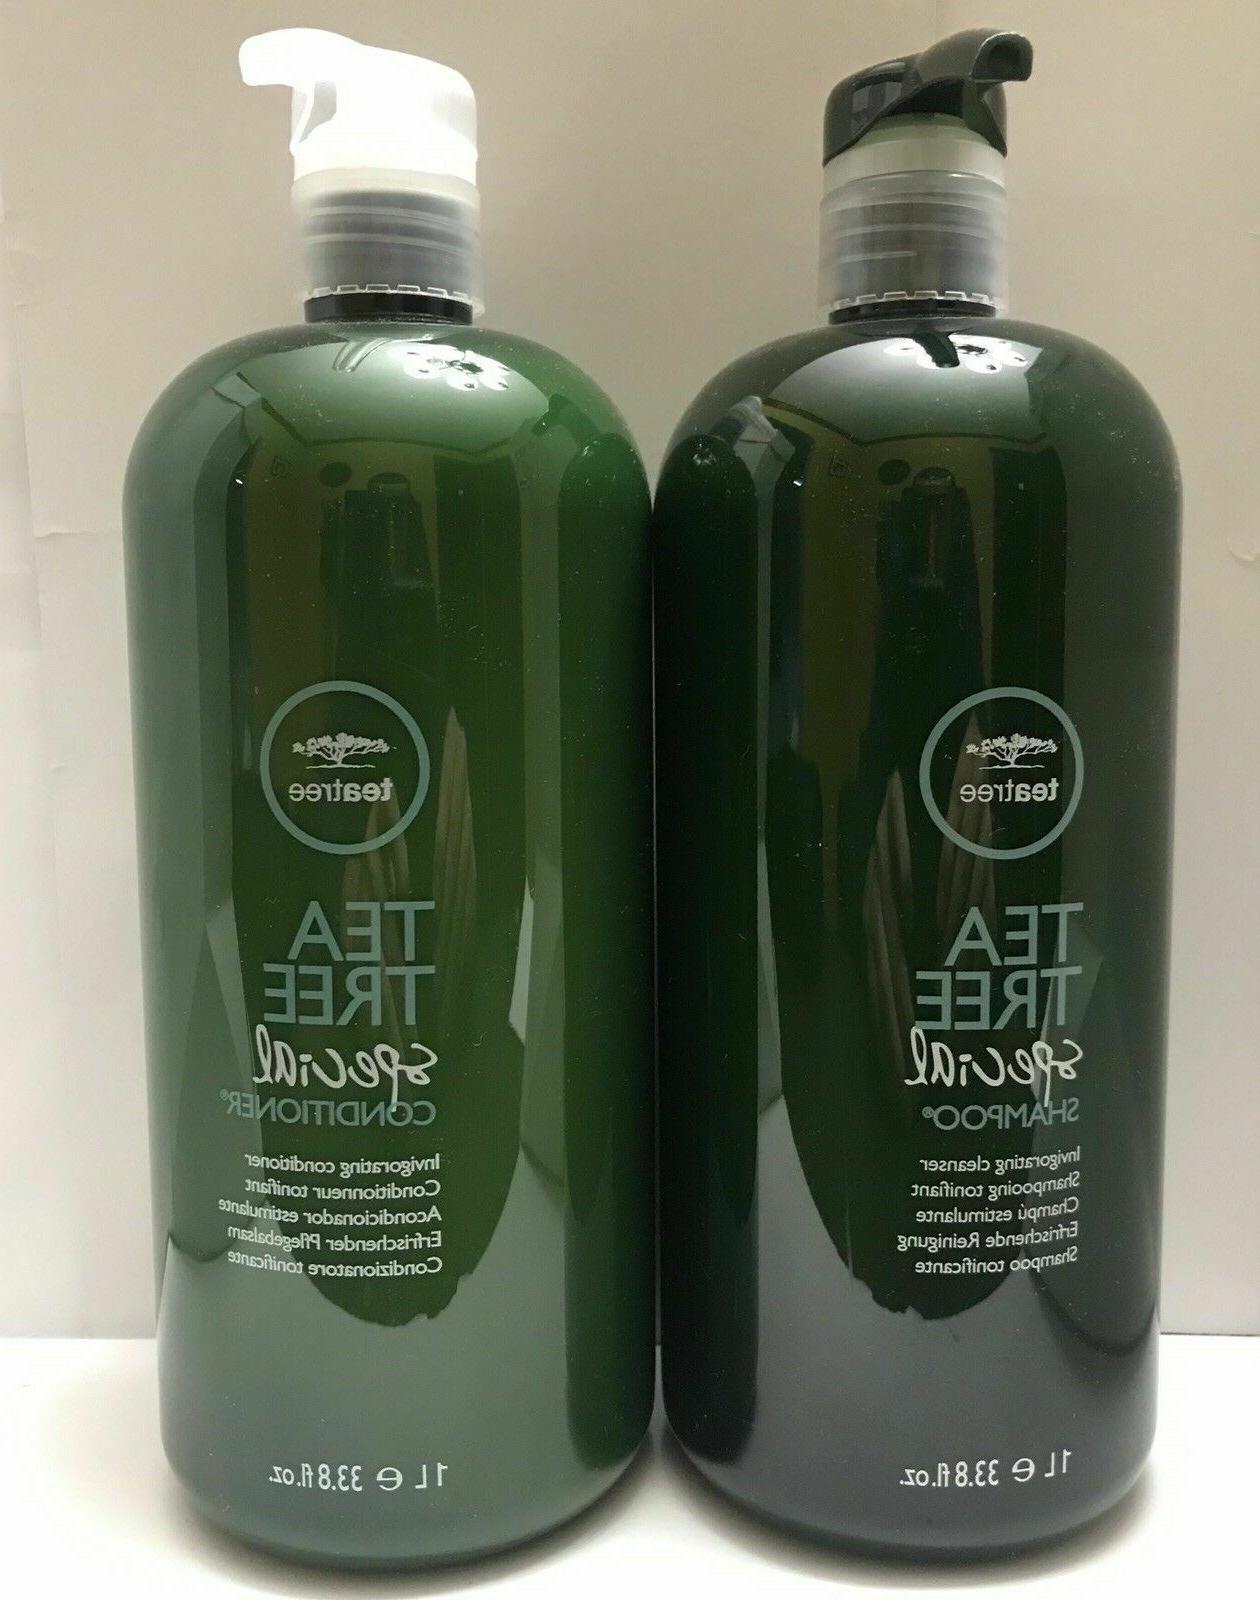 tea tree special shampoo conditioner duo liter